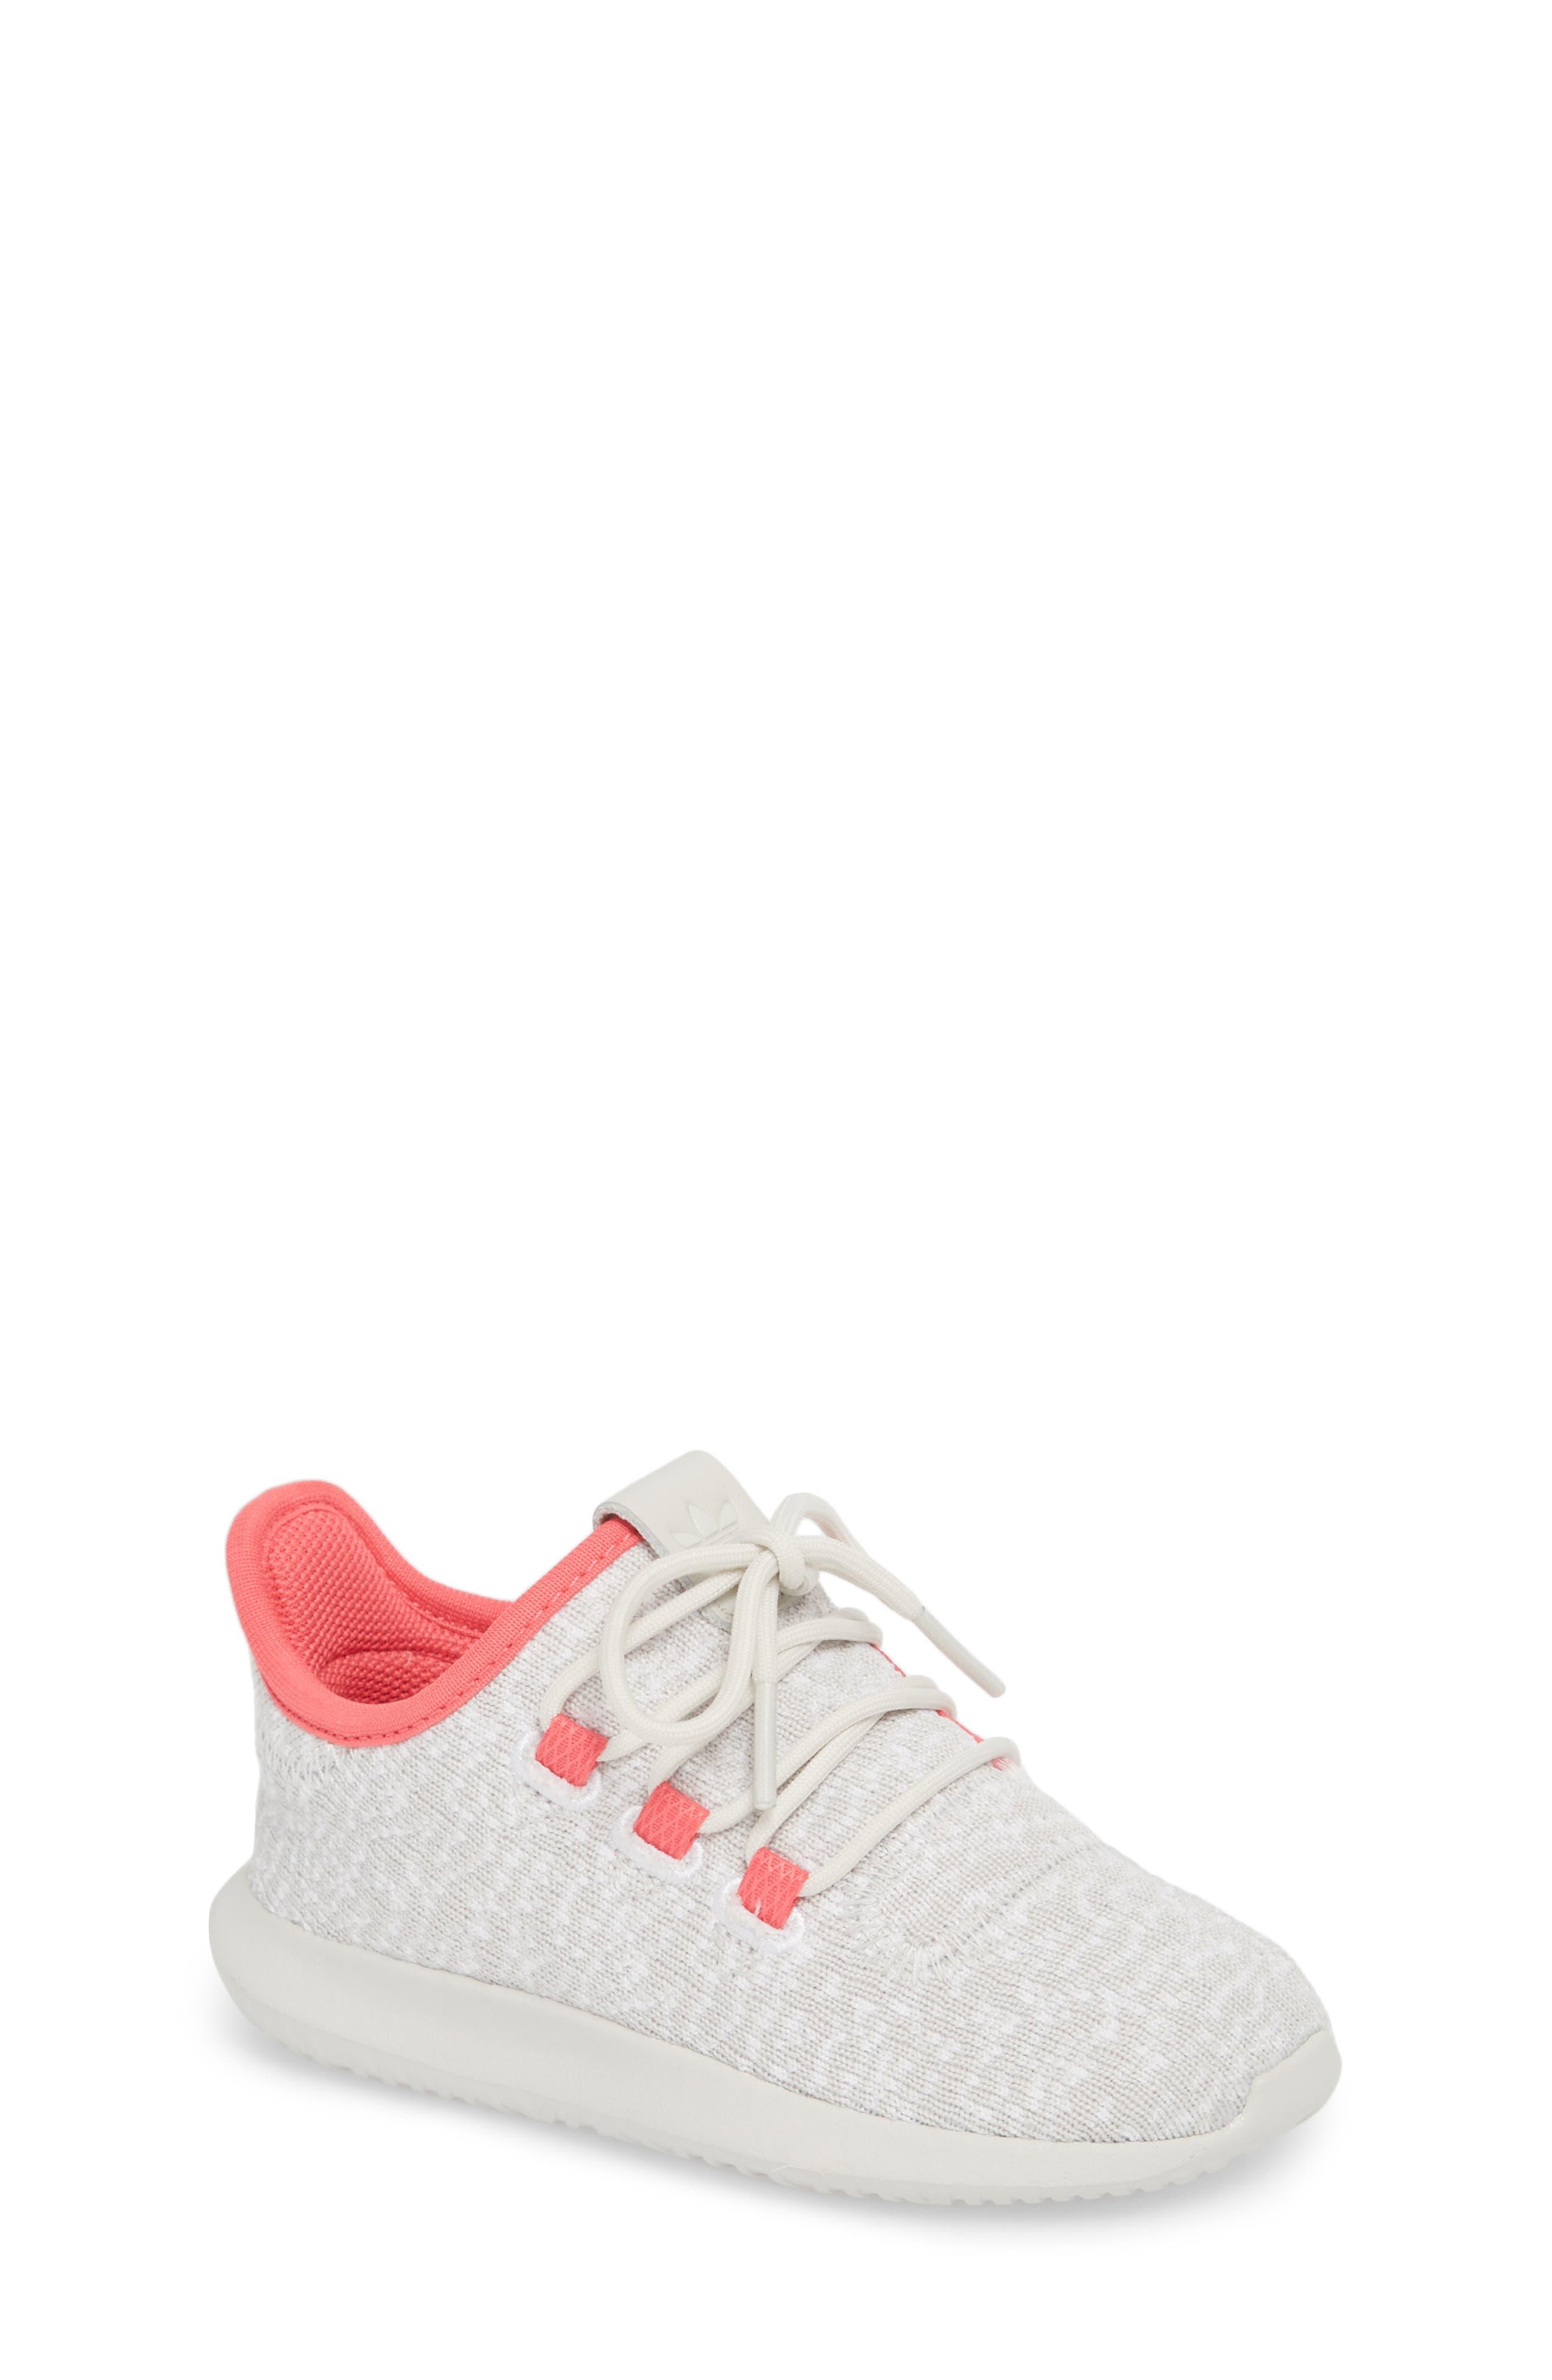 Tubular Shadow Sneaker,                         Main,                         color, Grey/ Ash Pink/ White